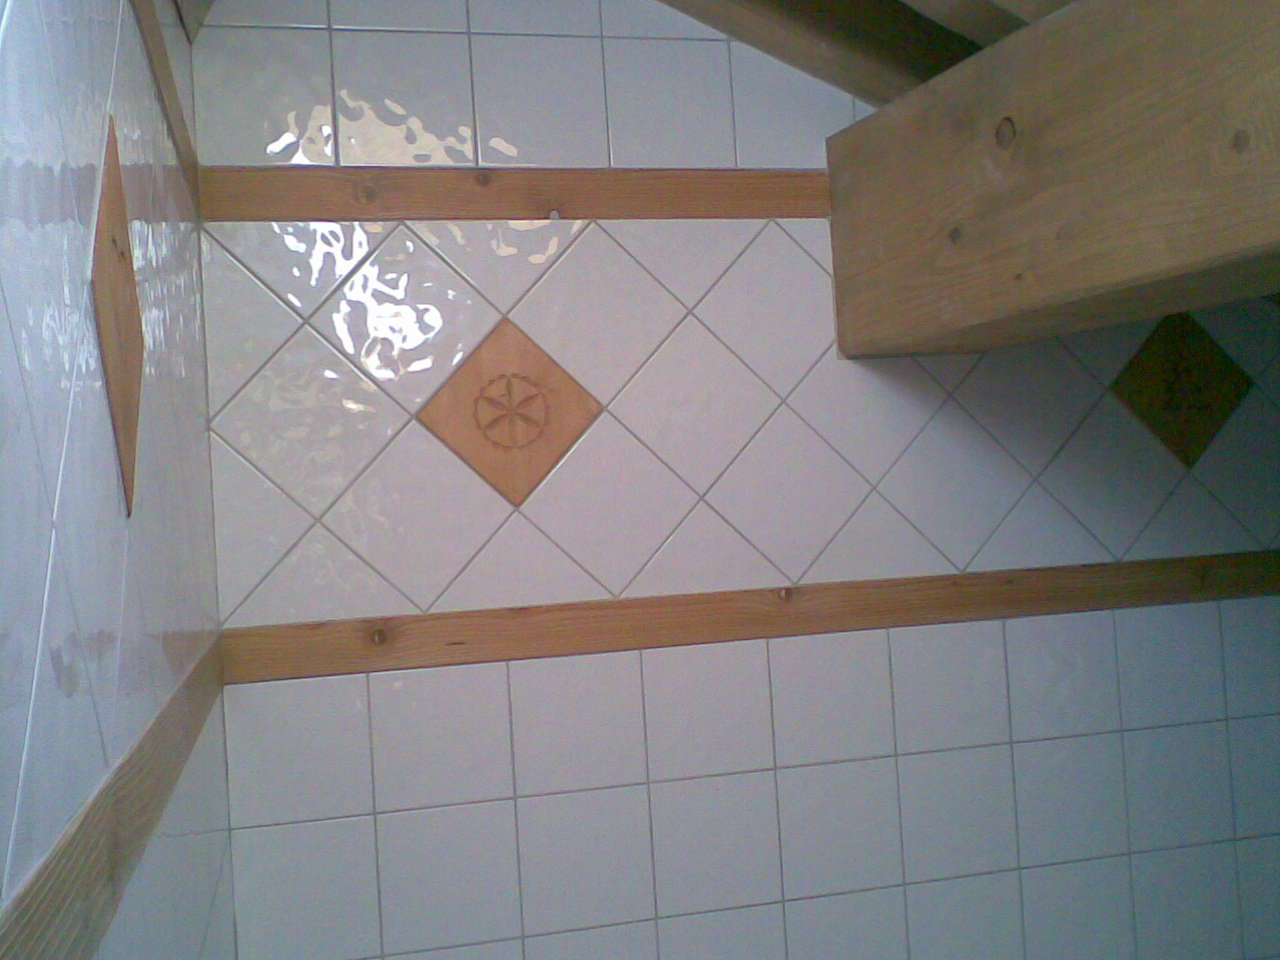 Service bricolage salle de bain en faience bois for Bricolage salle de bain